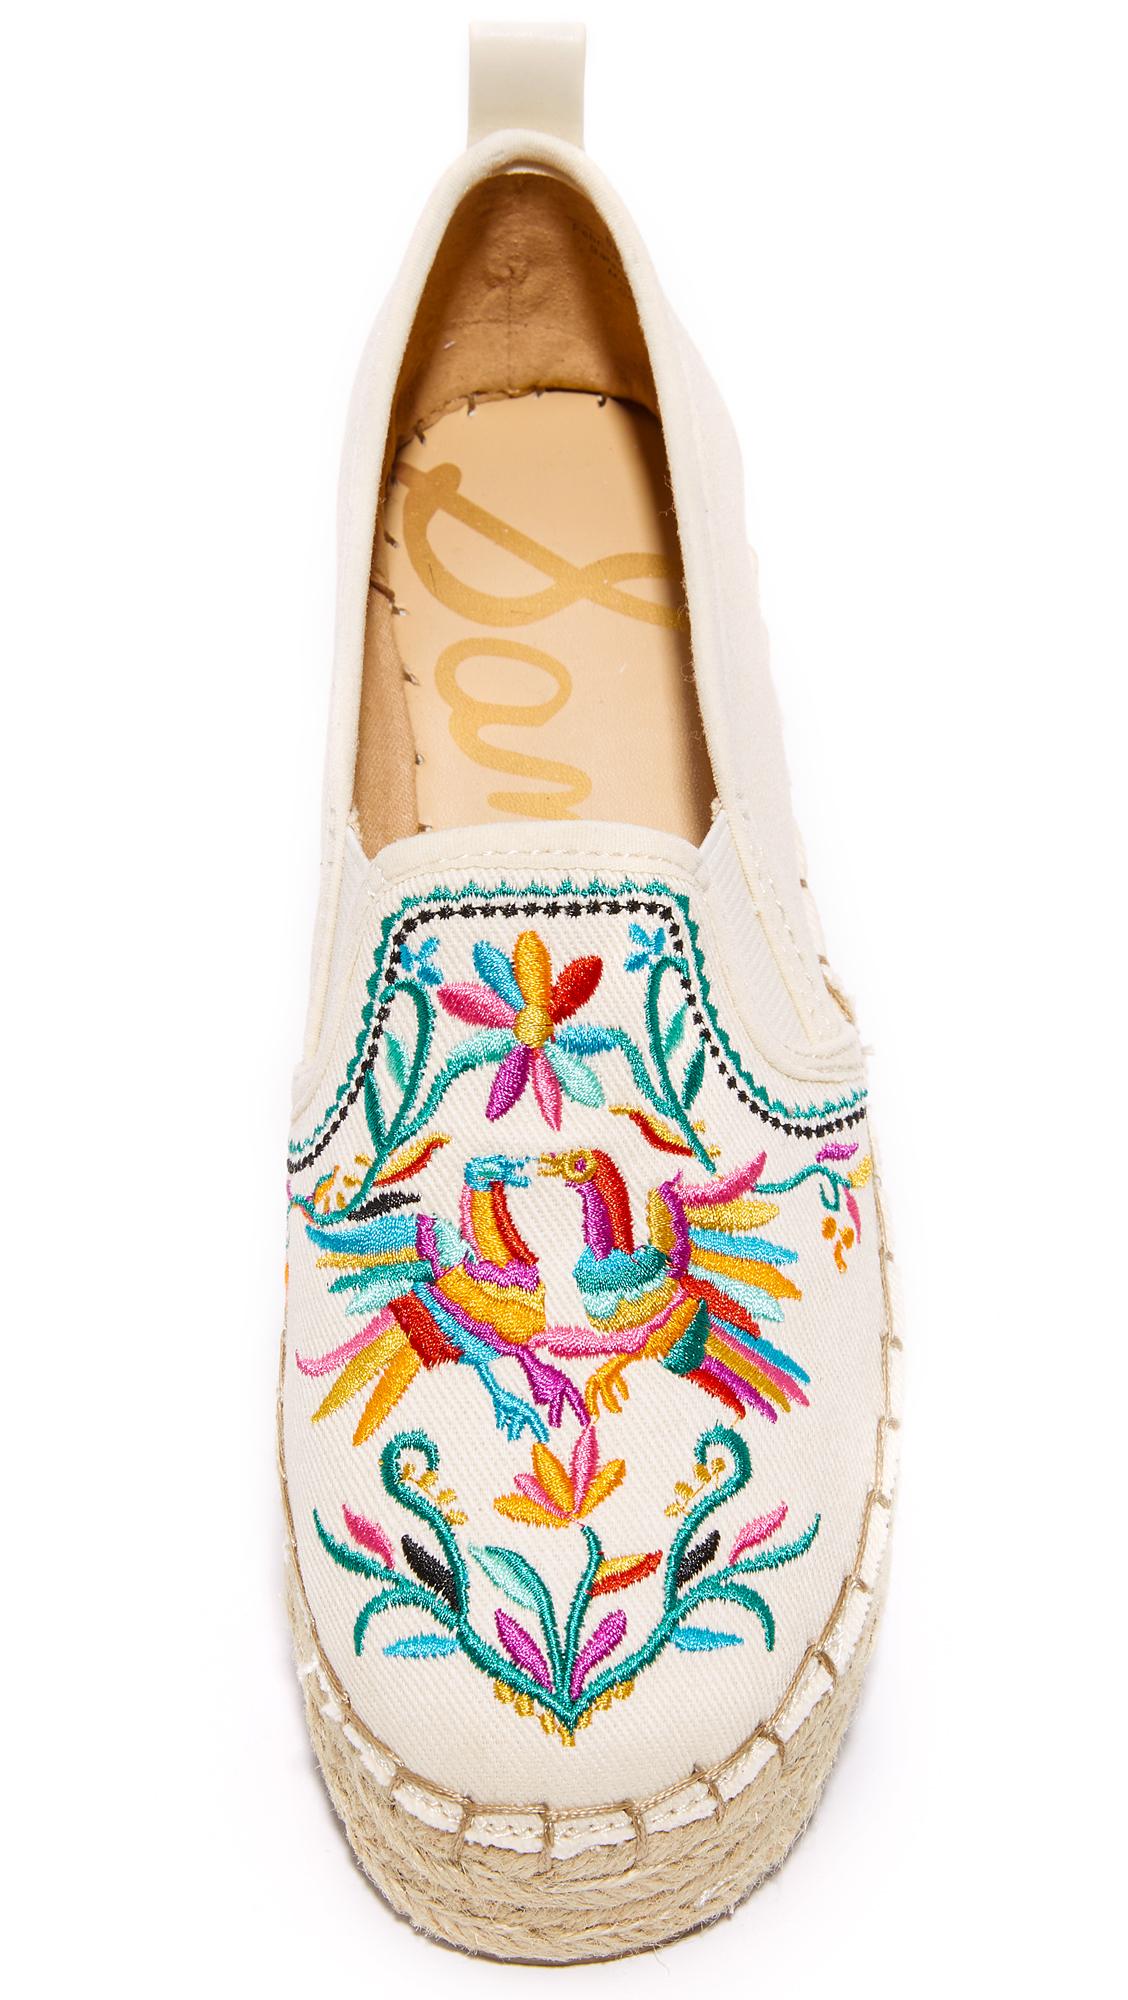 27166823ce90 Sam Edelman Carrin II Embroidered Espadrilles